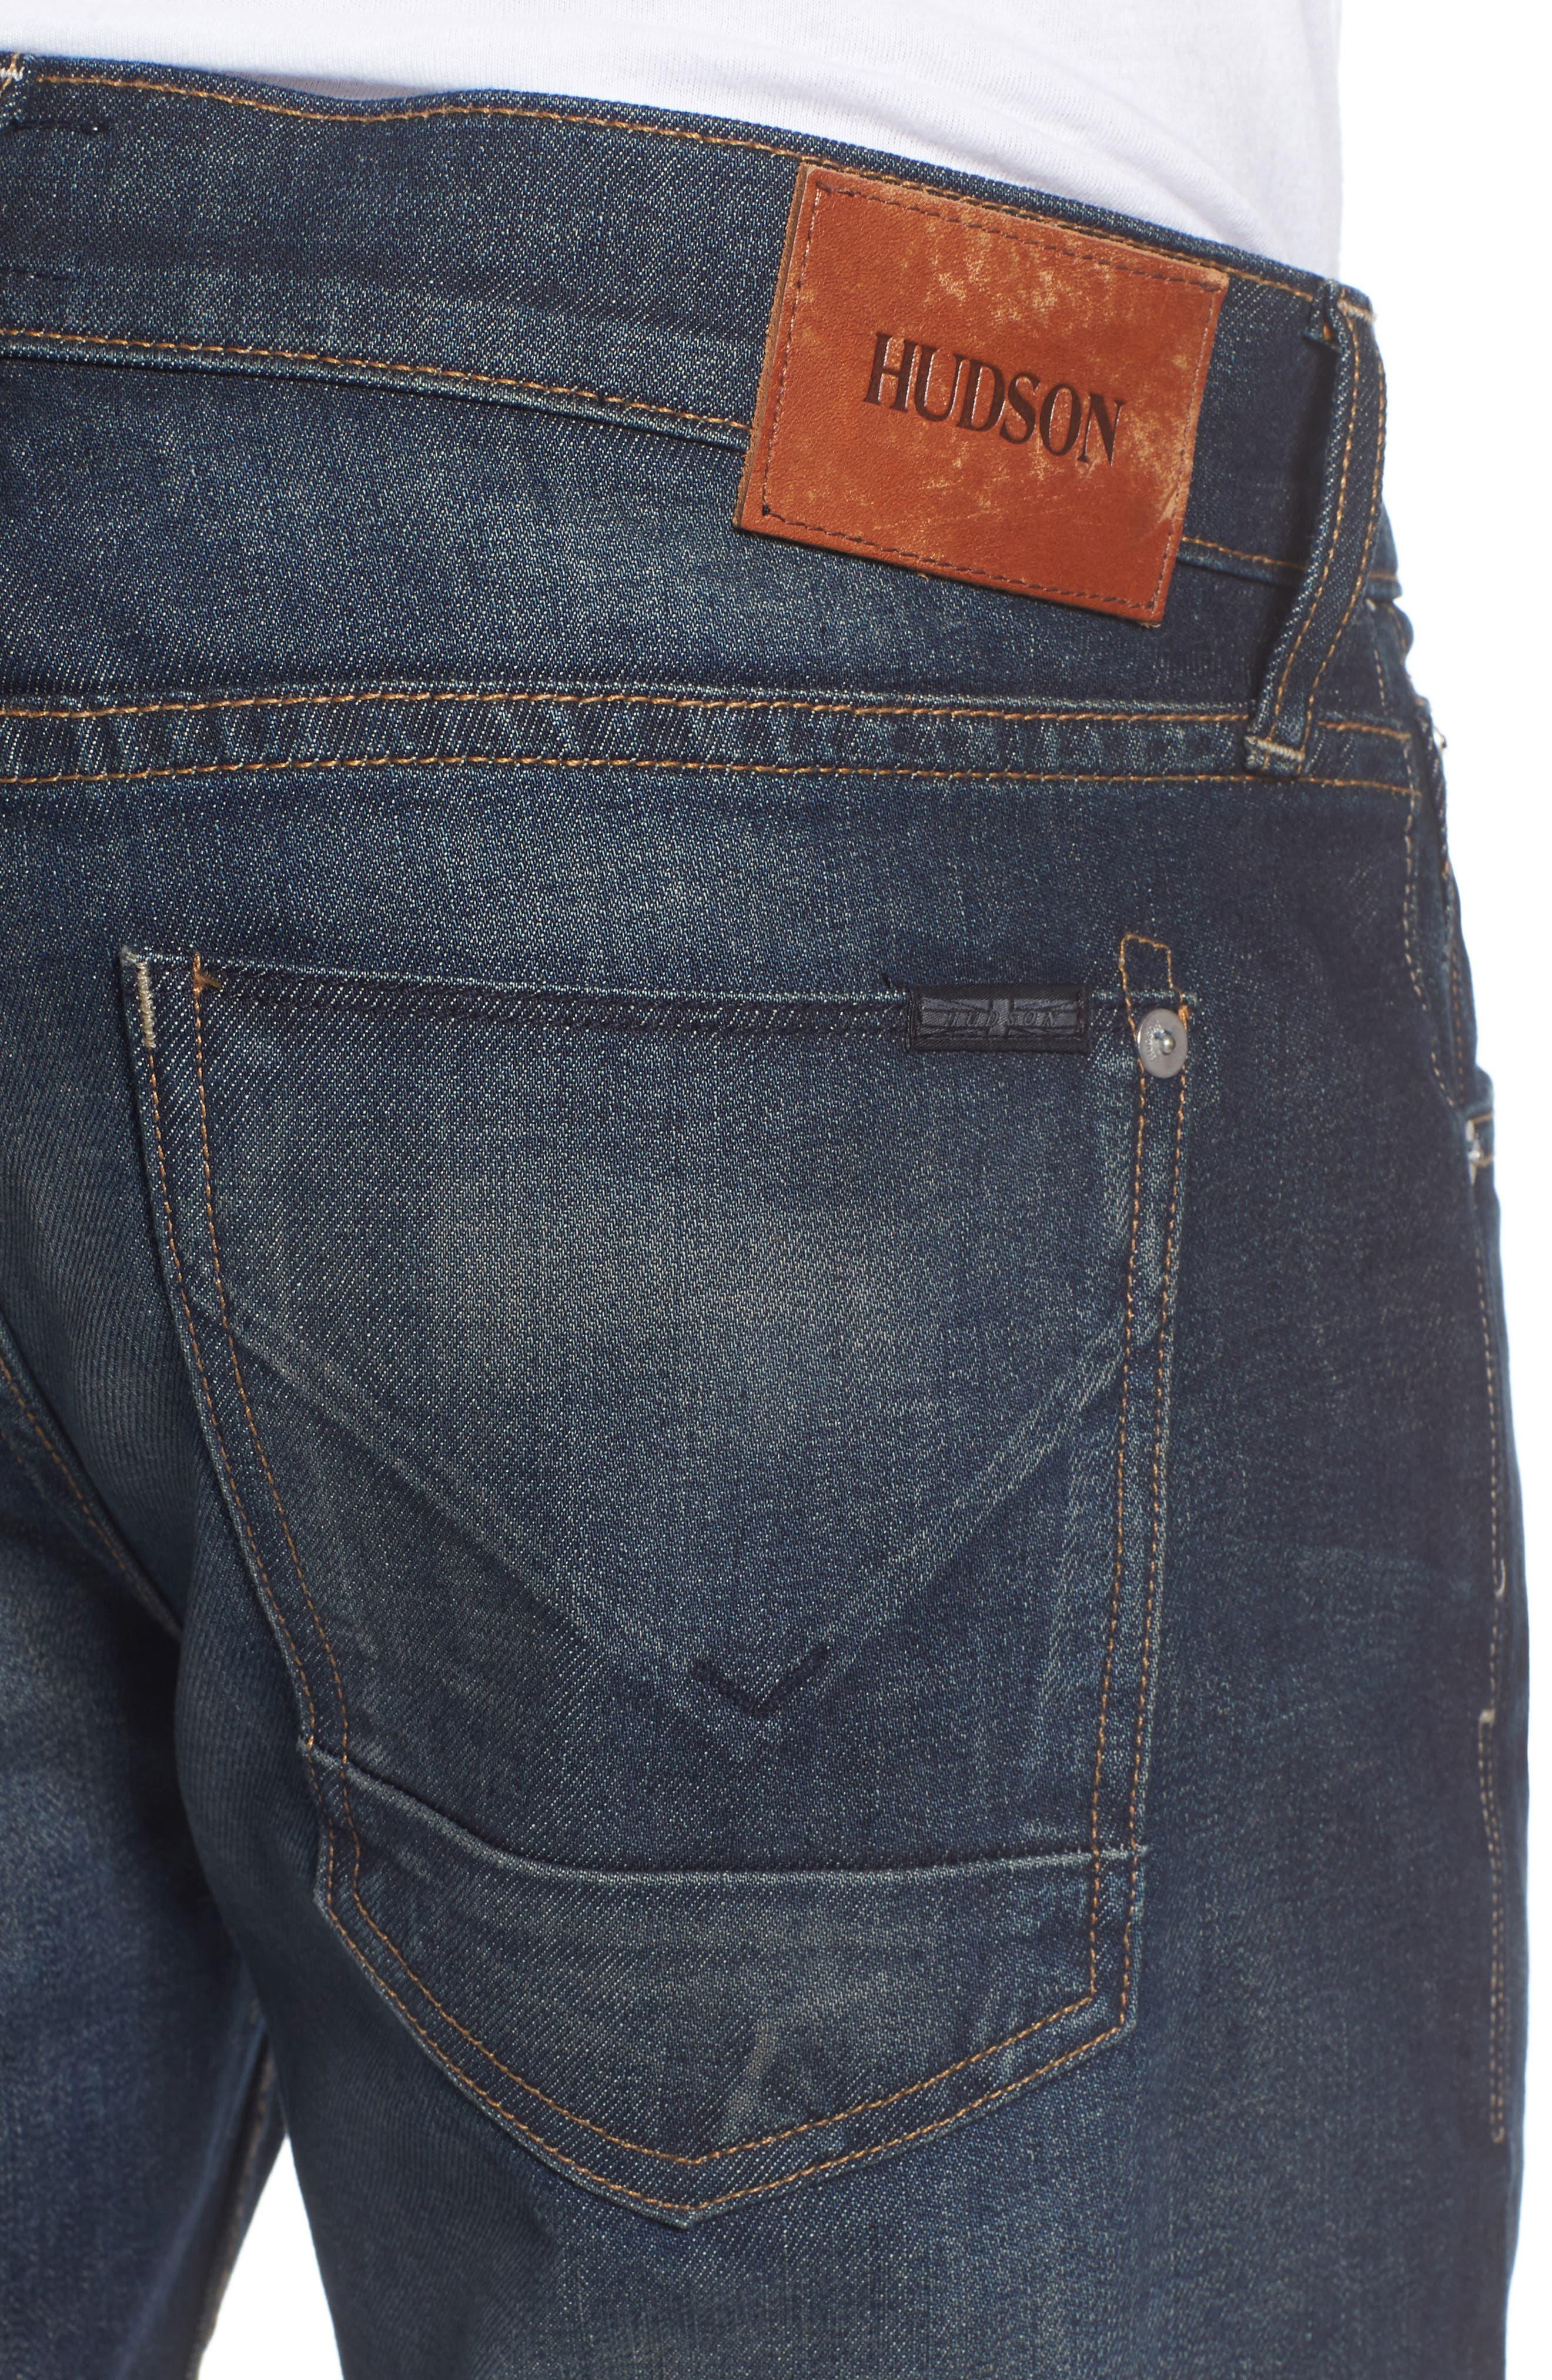 Blake Slim Fit Jeans,                             Alternate thumbnail 4, color,                             420